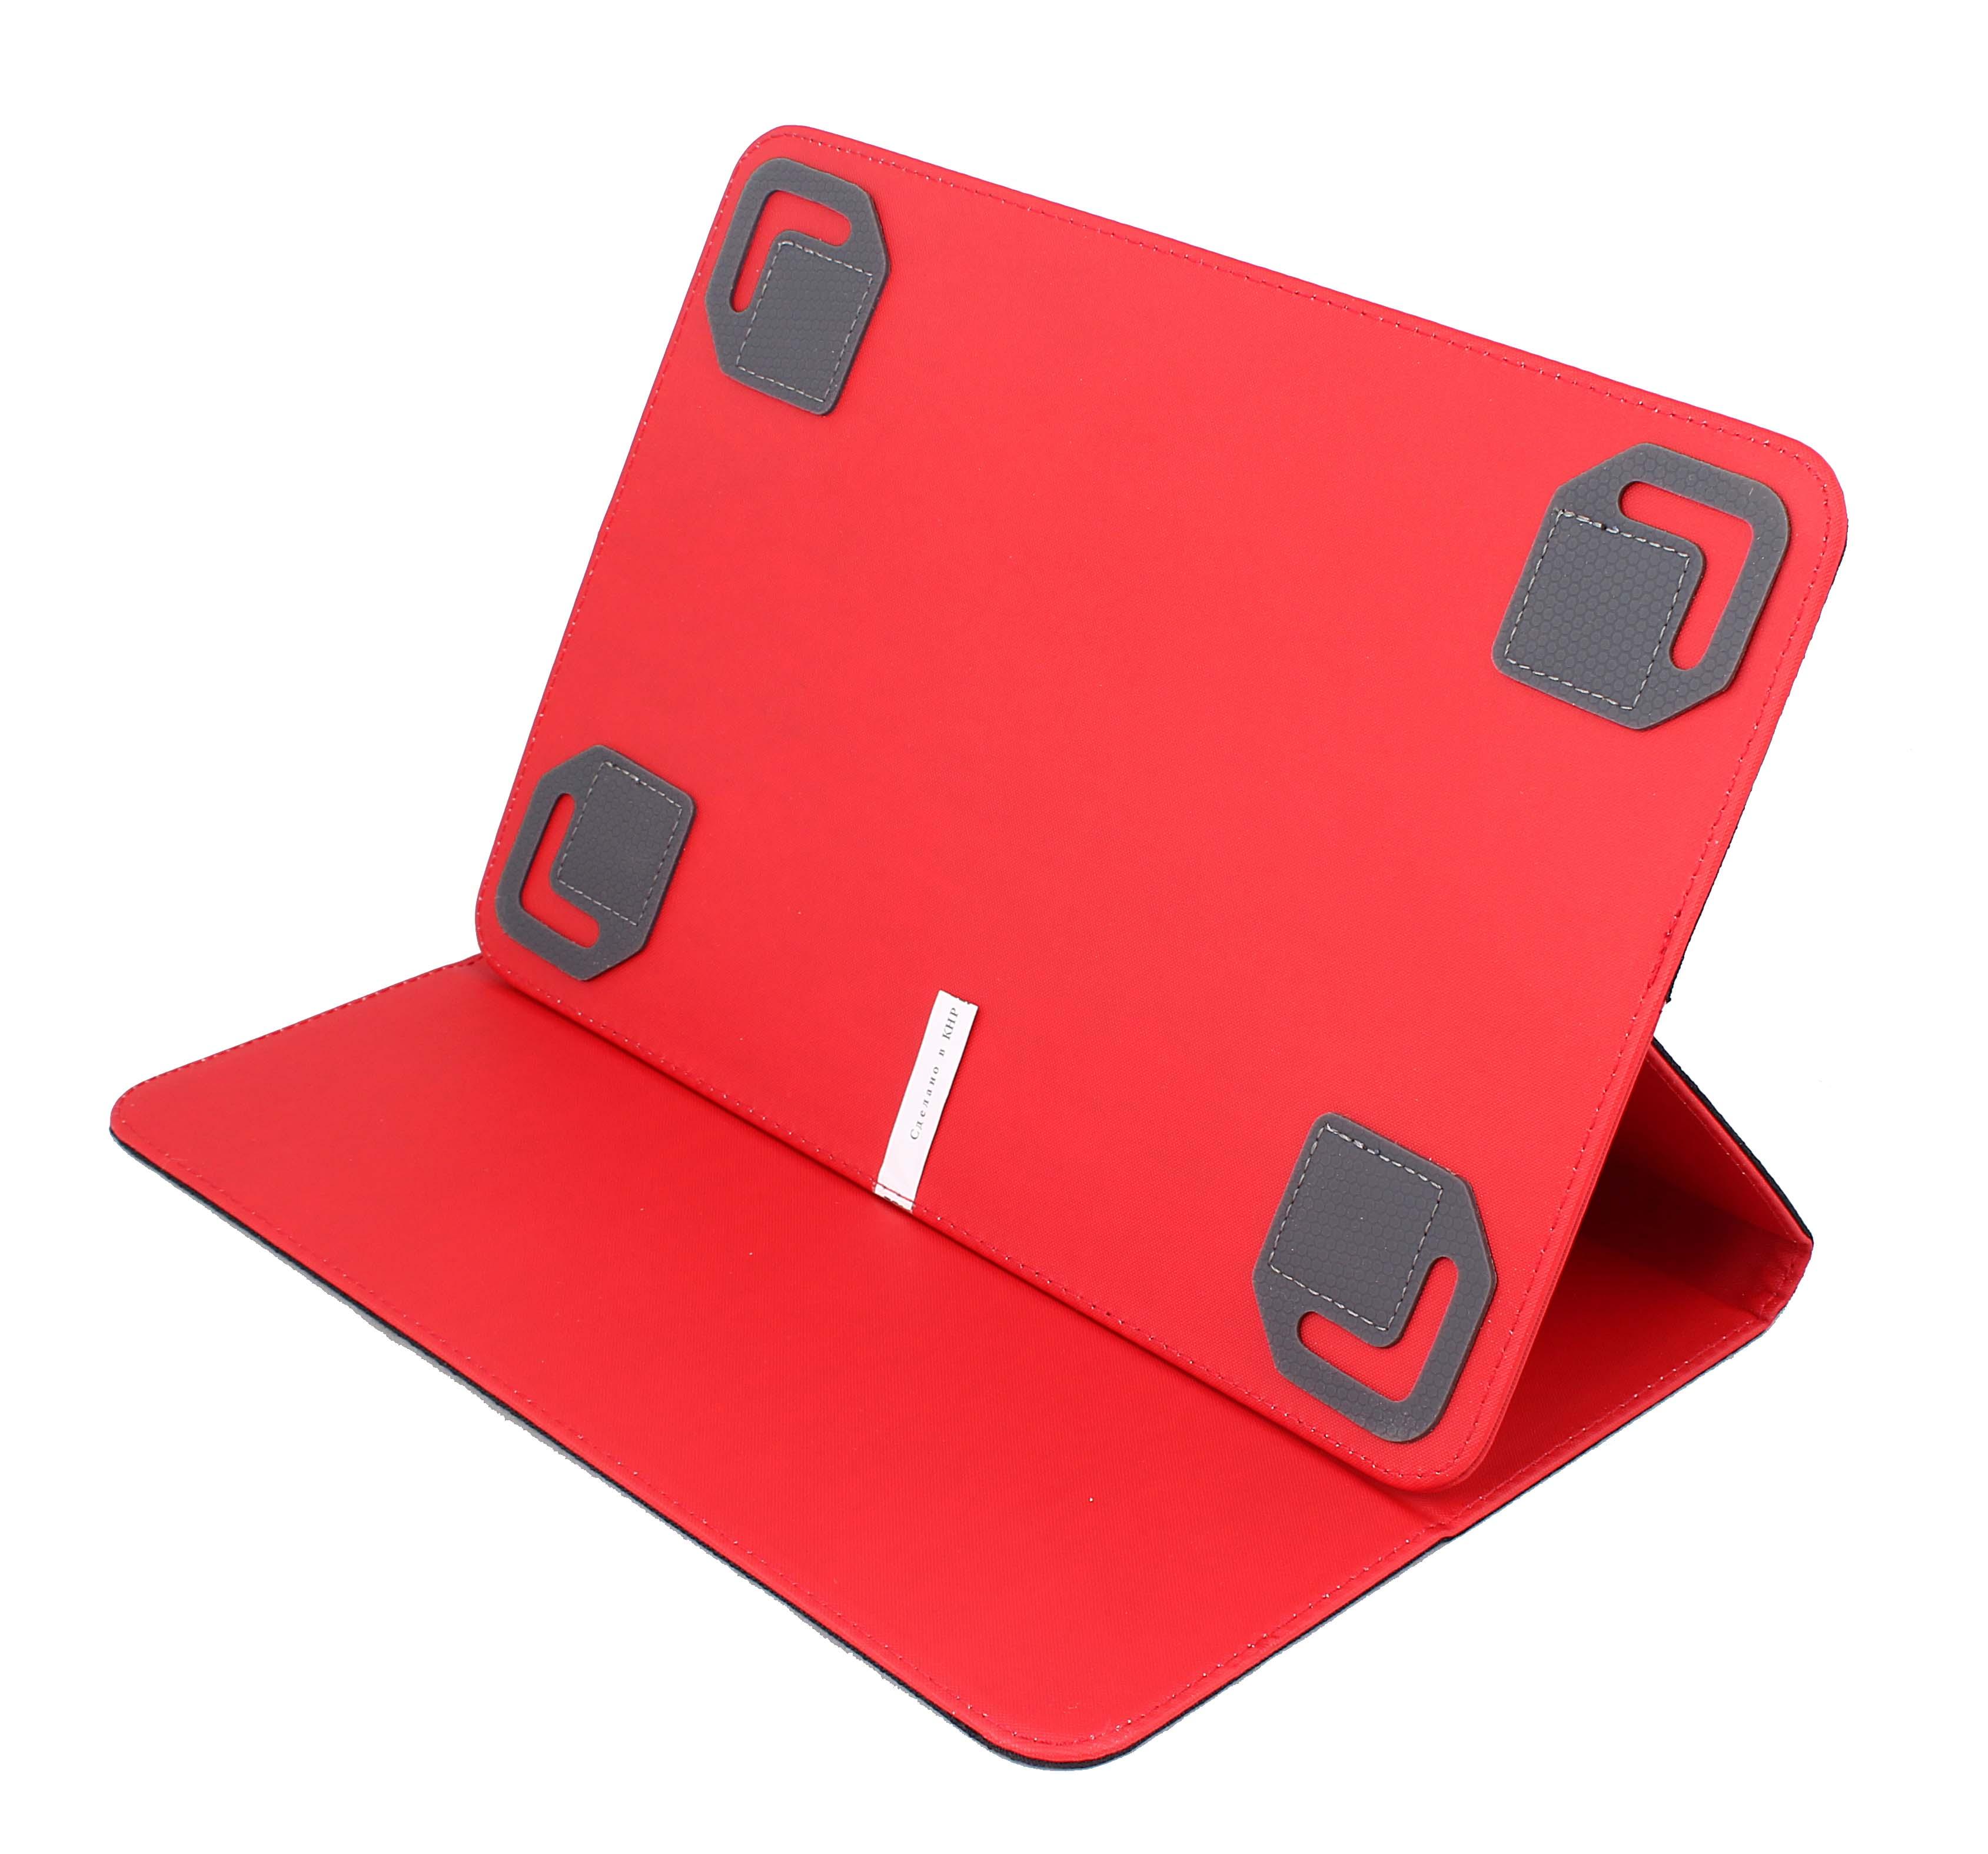 Чехол для планшетного ПК Рбт Real Brand Technics 799.000